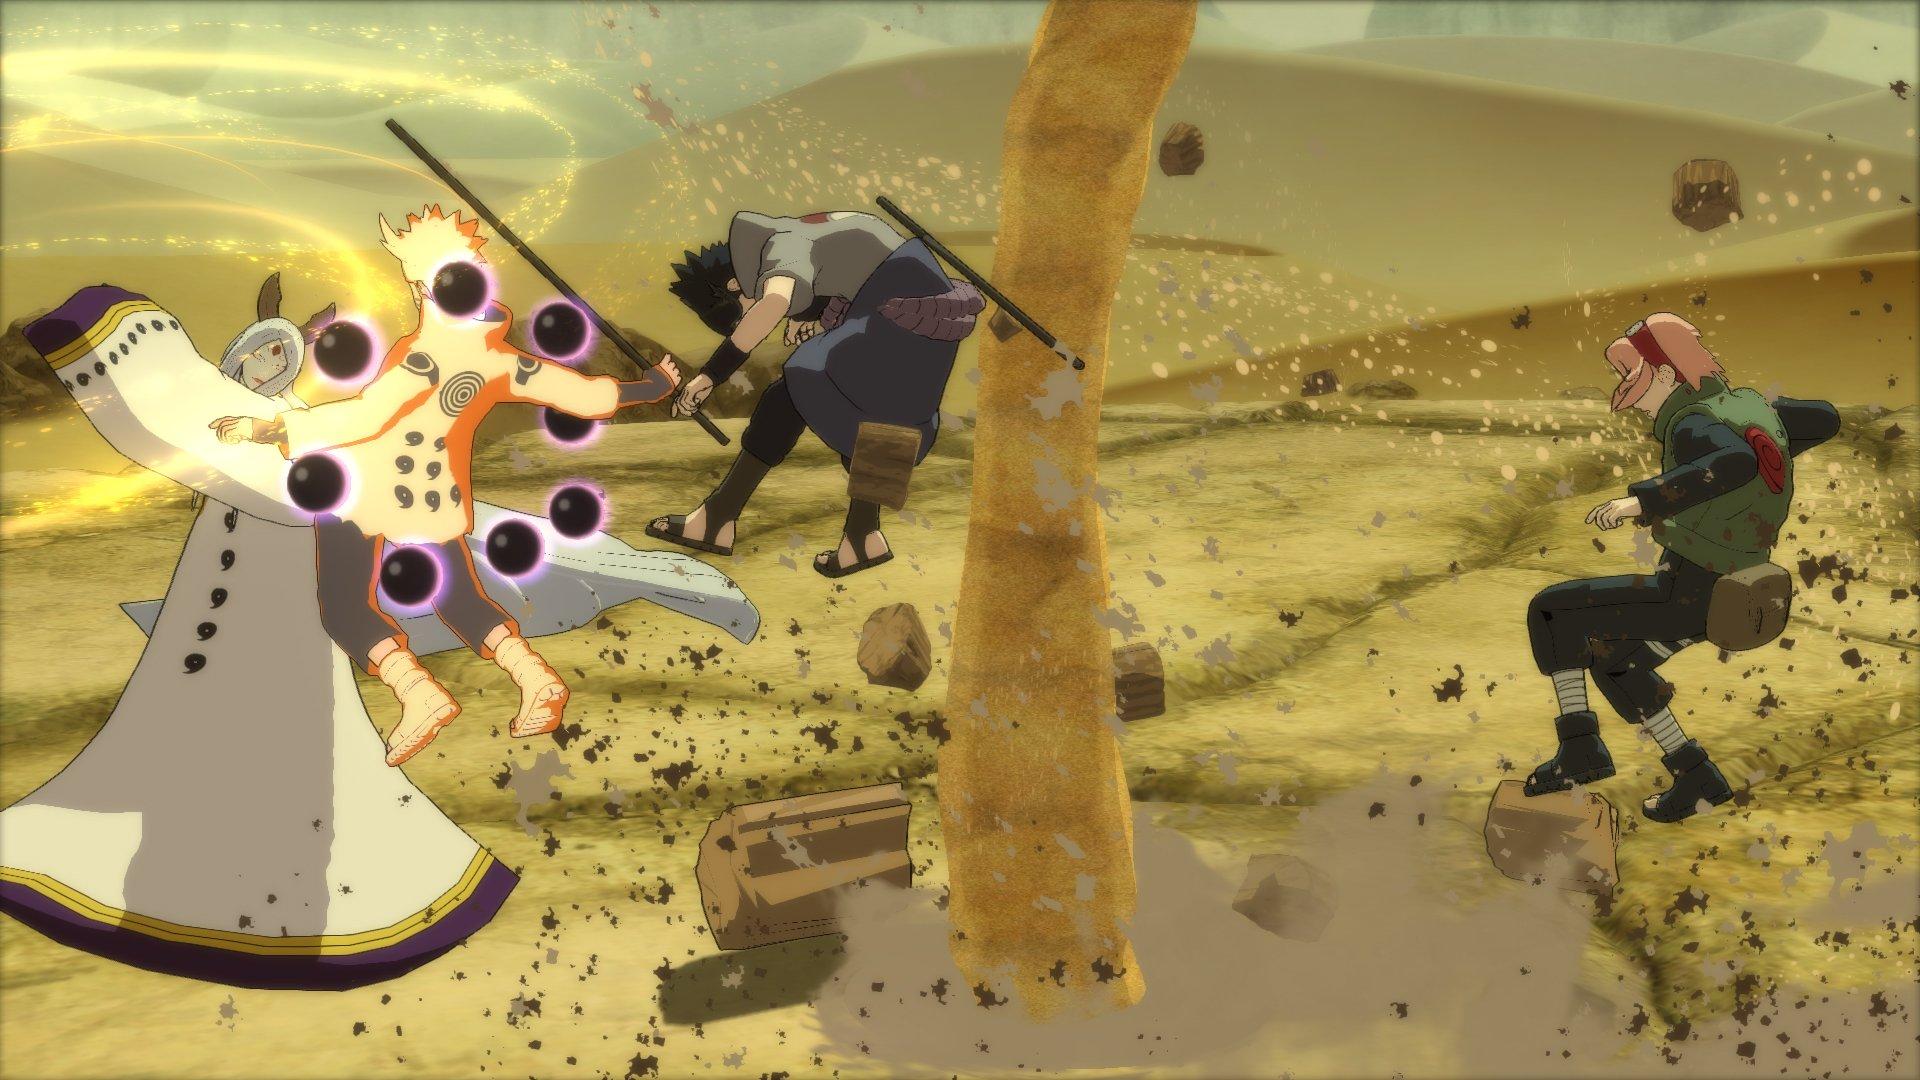 01_1437139167 Naruto Shippuden Ultimate Ninja Storm 4